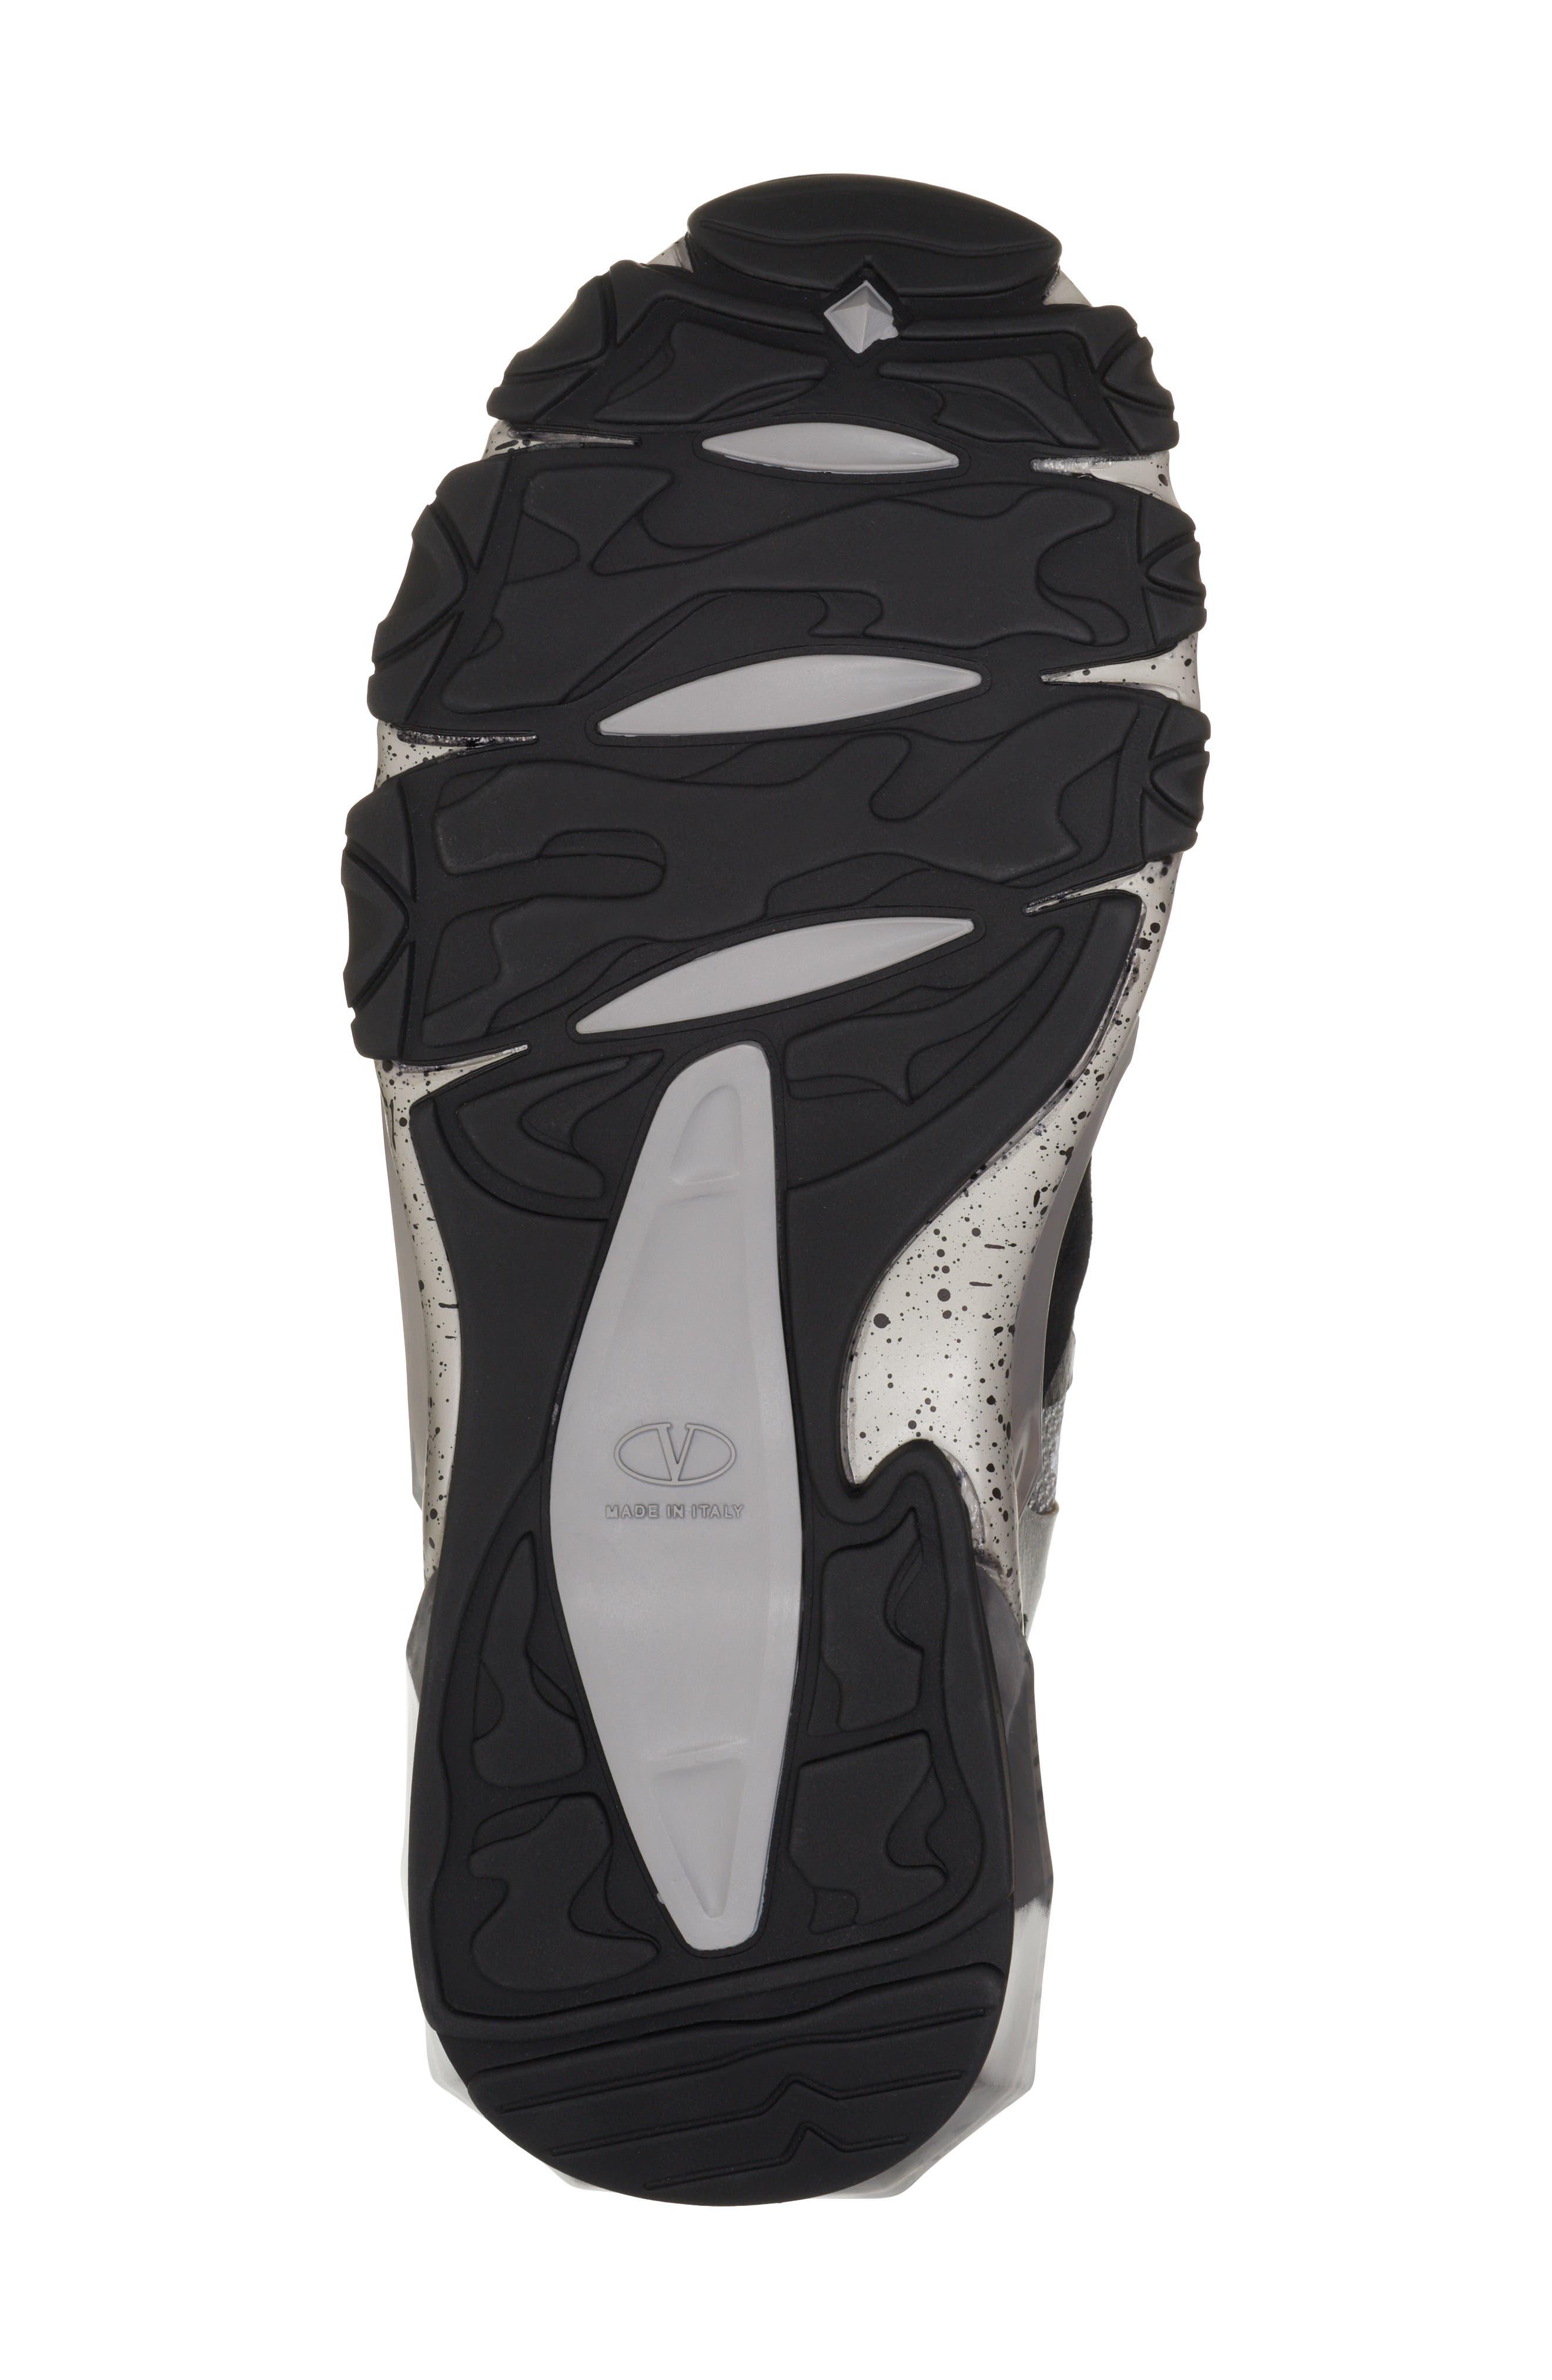 Bounce Sneaker,                             Alternate thumbnail 6, color,                             DARK SILVER/ BLACK